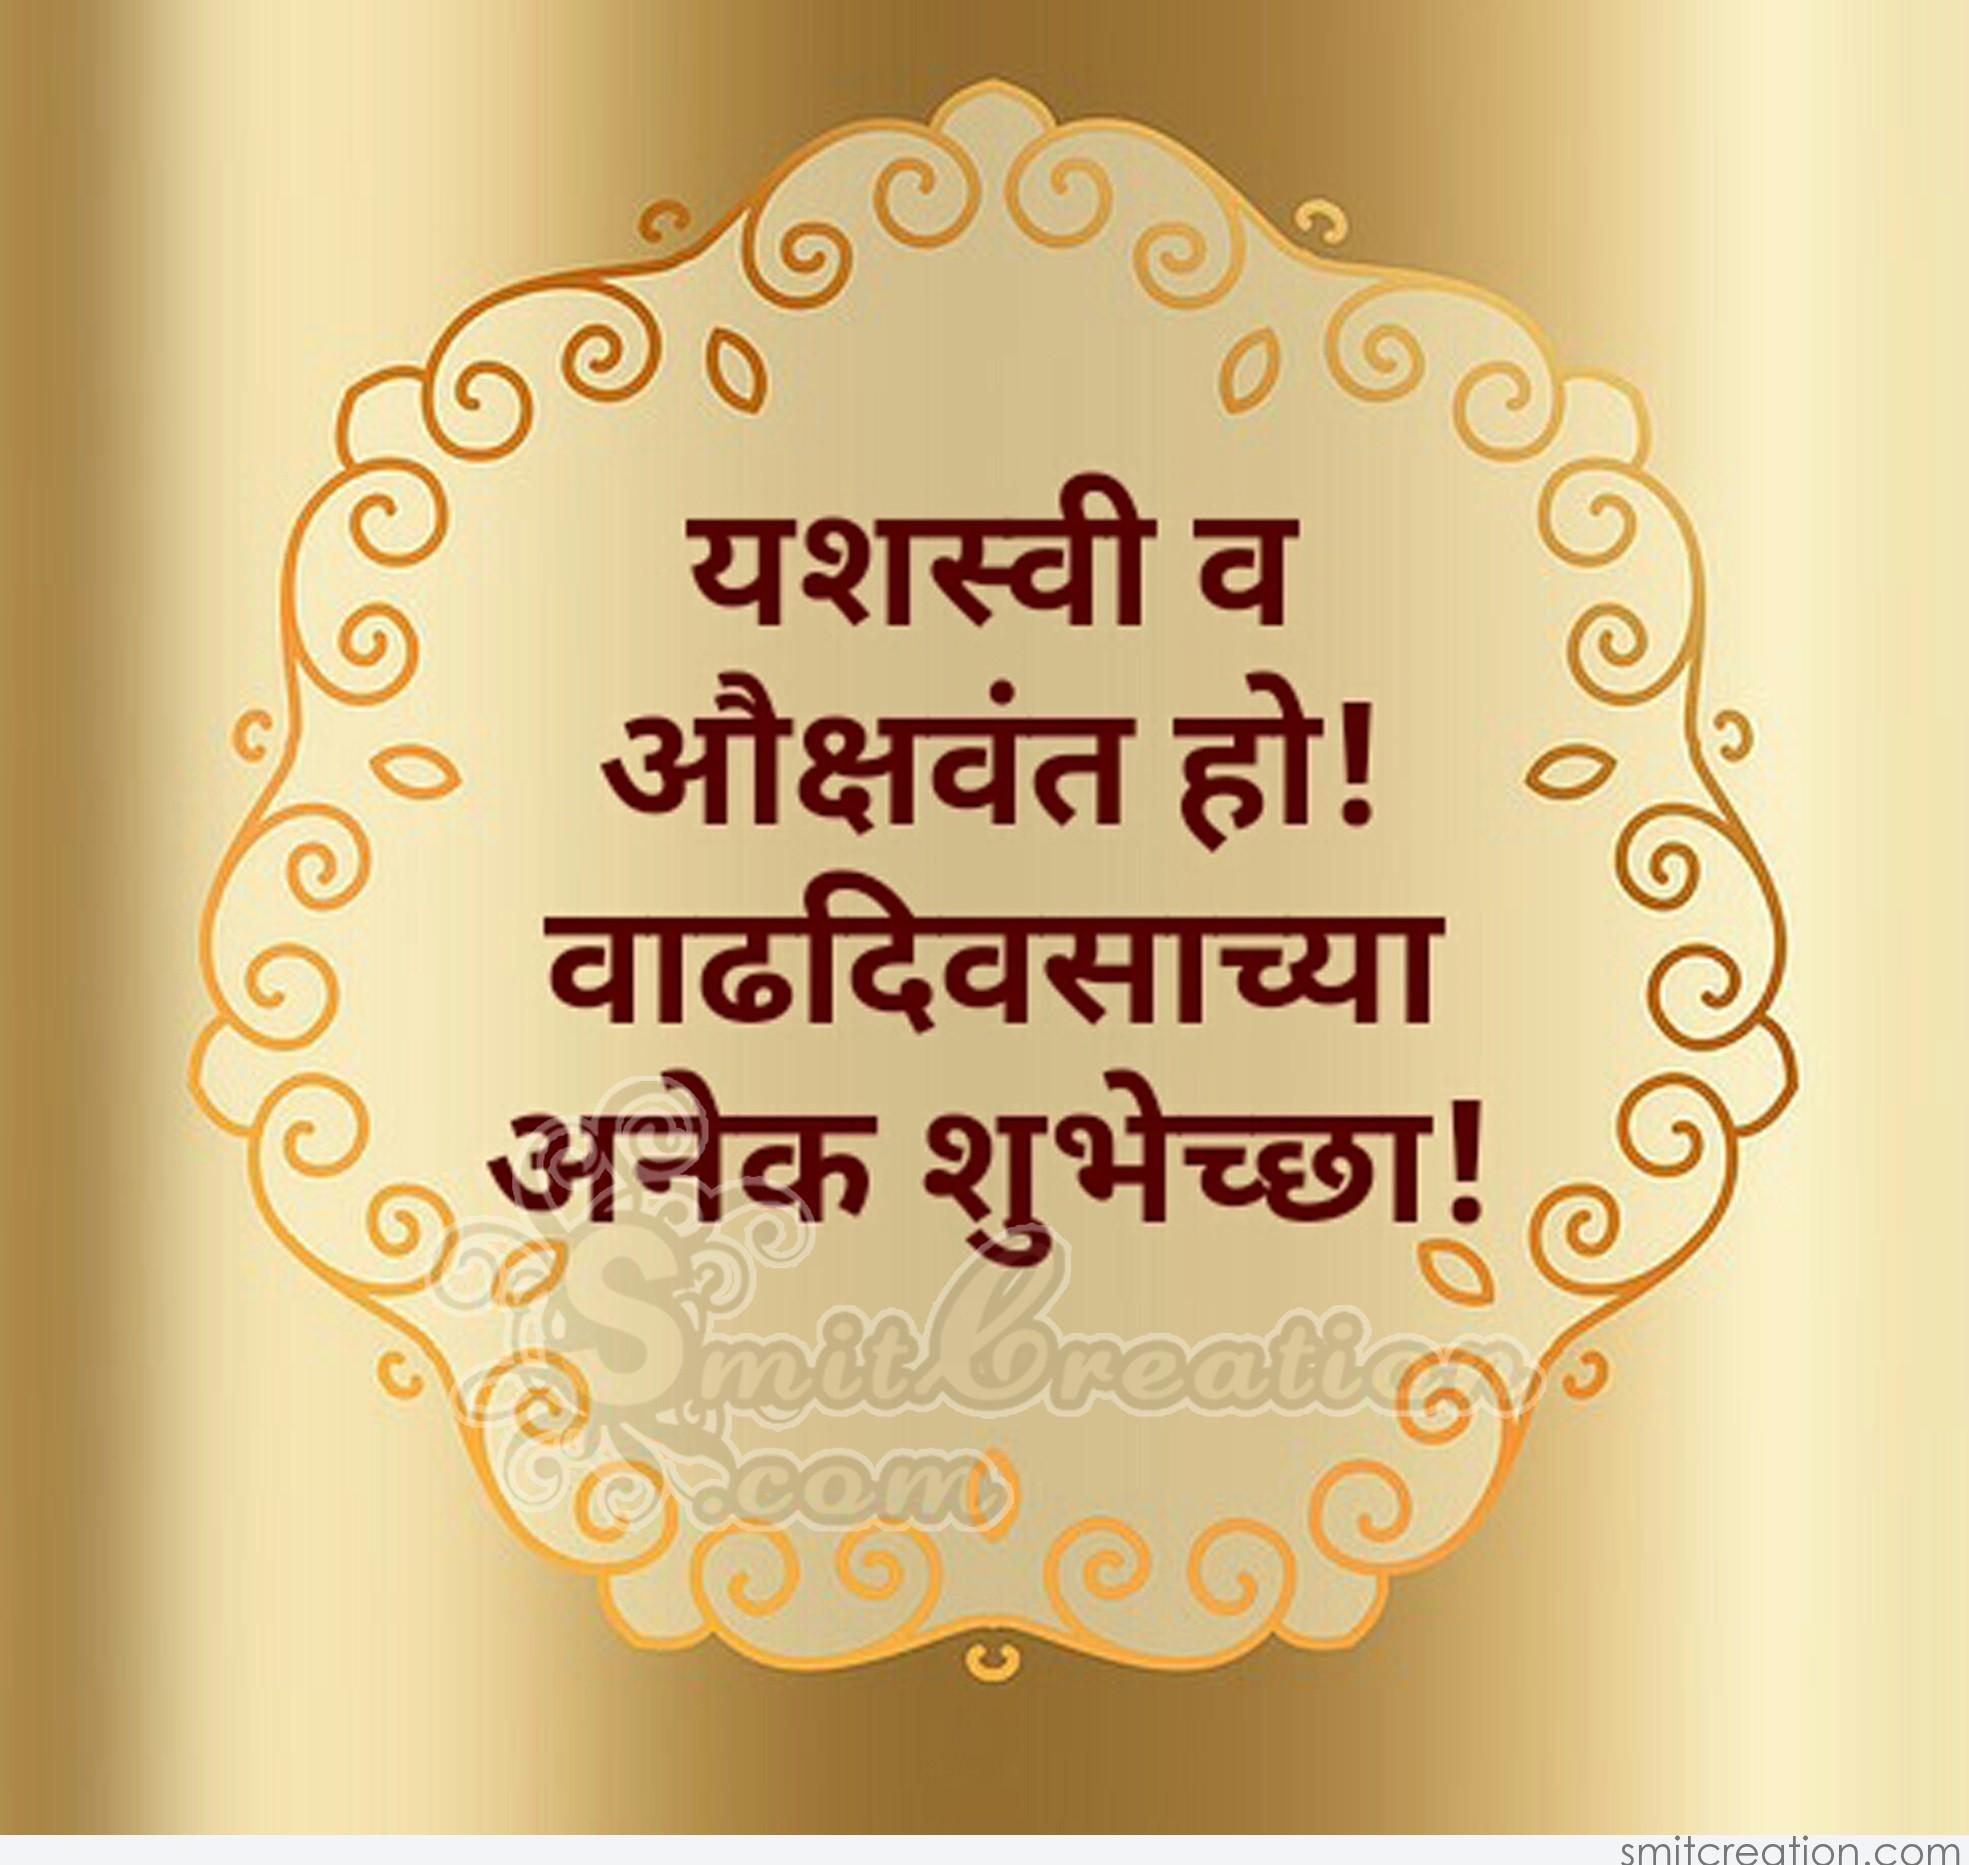 Vadhdivsachya Hardik Shubhechha   www.imgkid.com - The ... Vadhdivas Chya Hardik Shubhechha